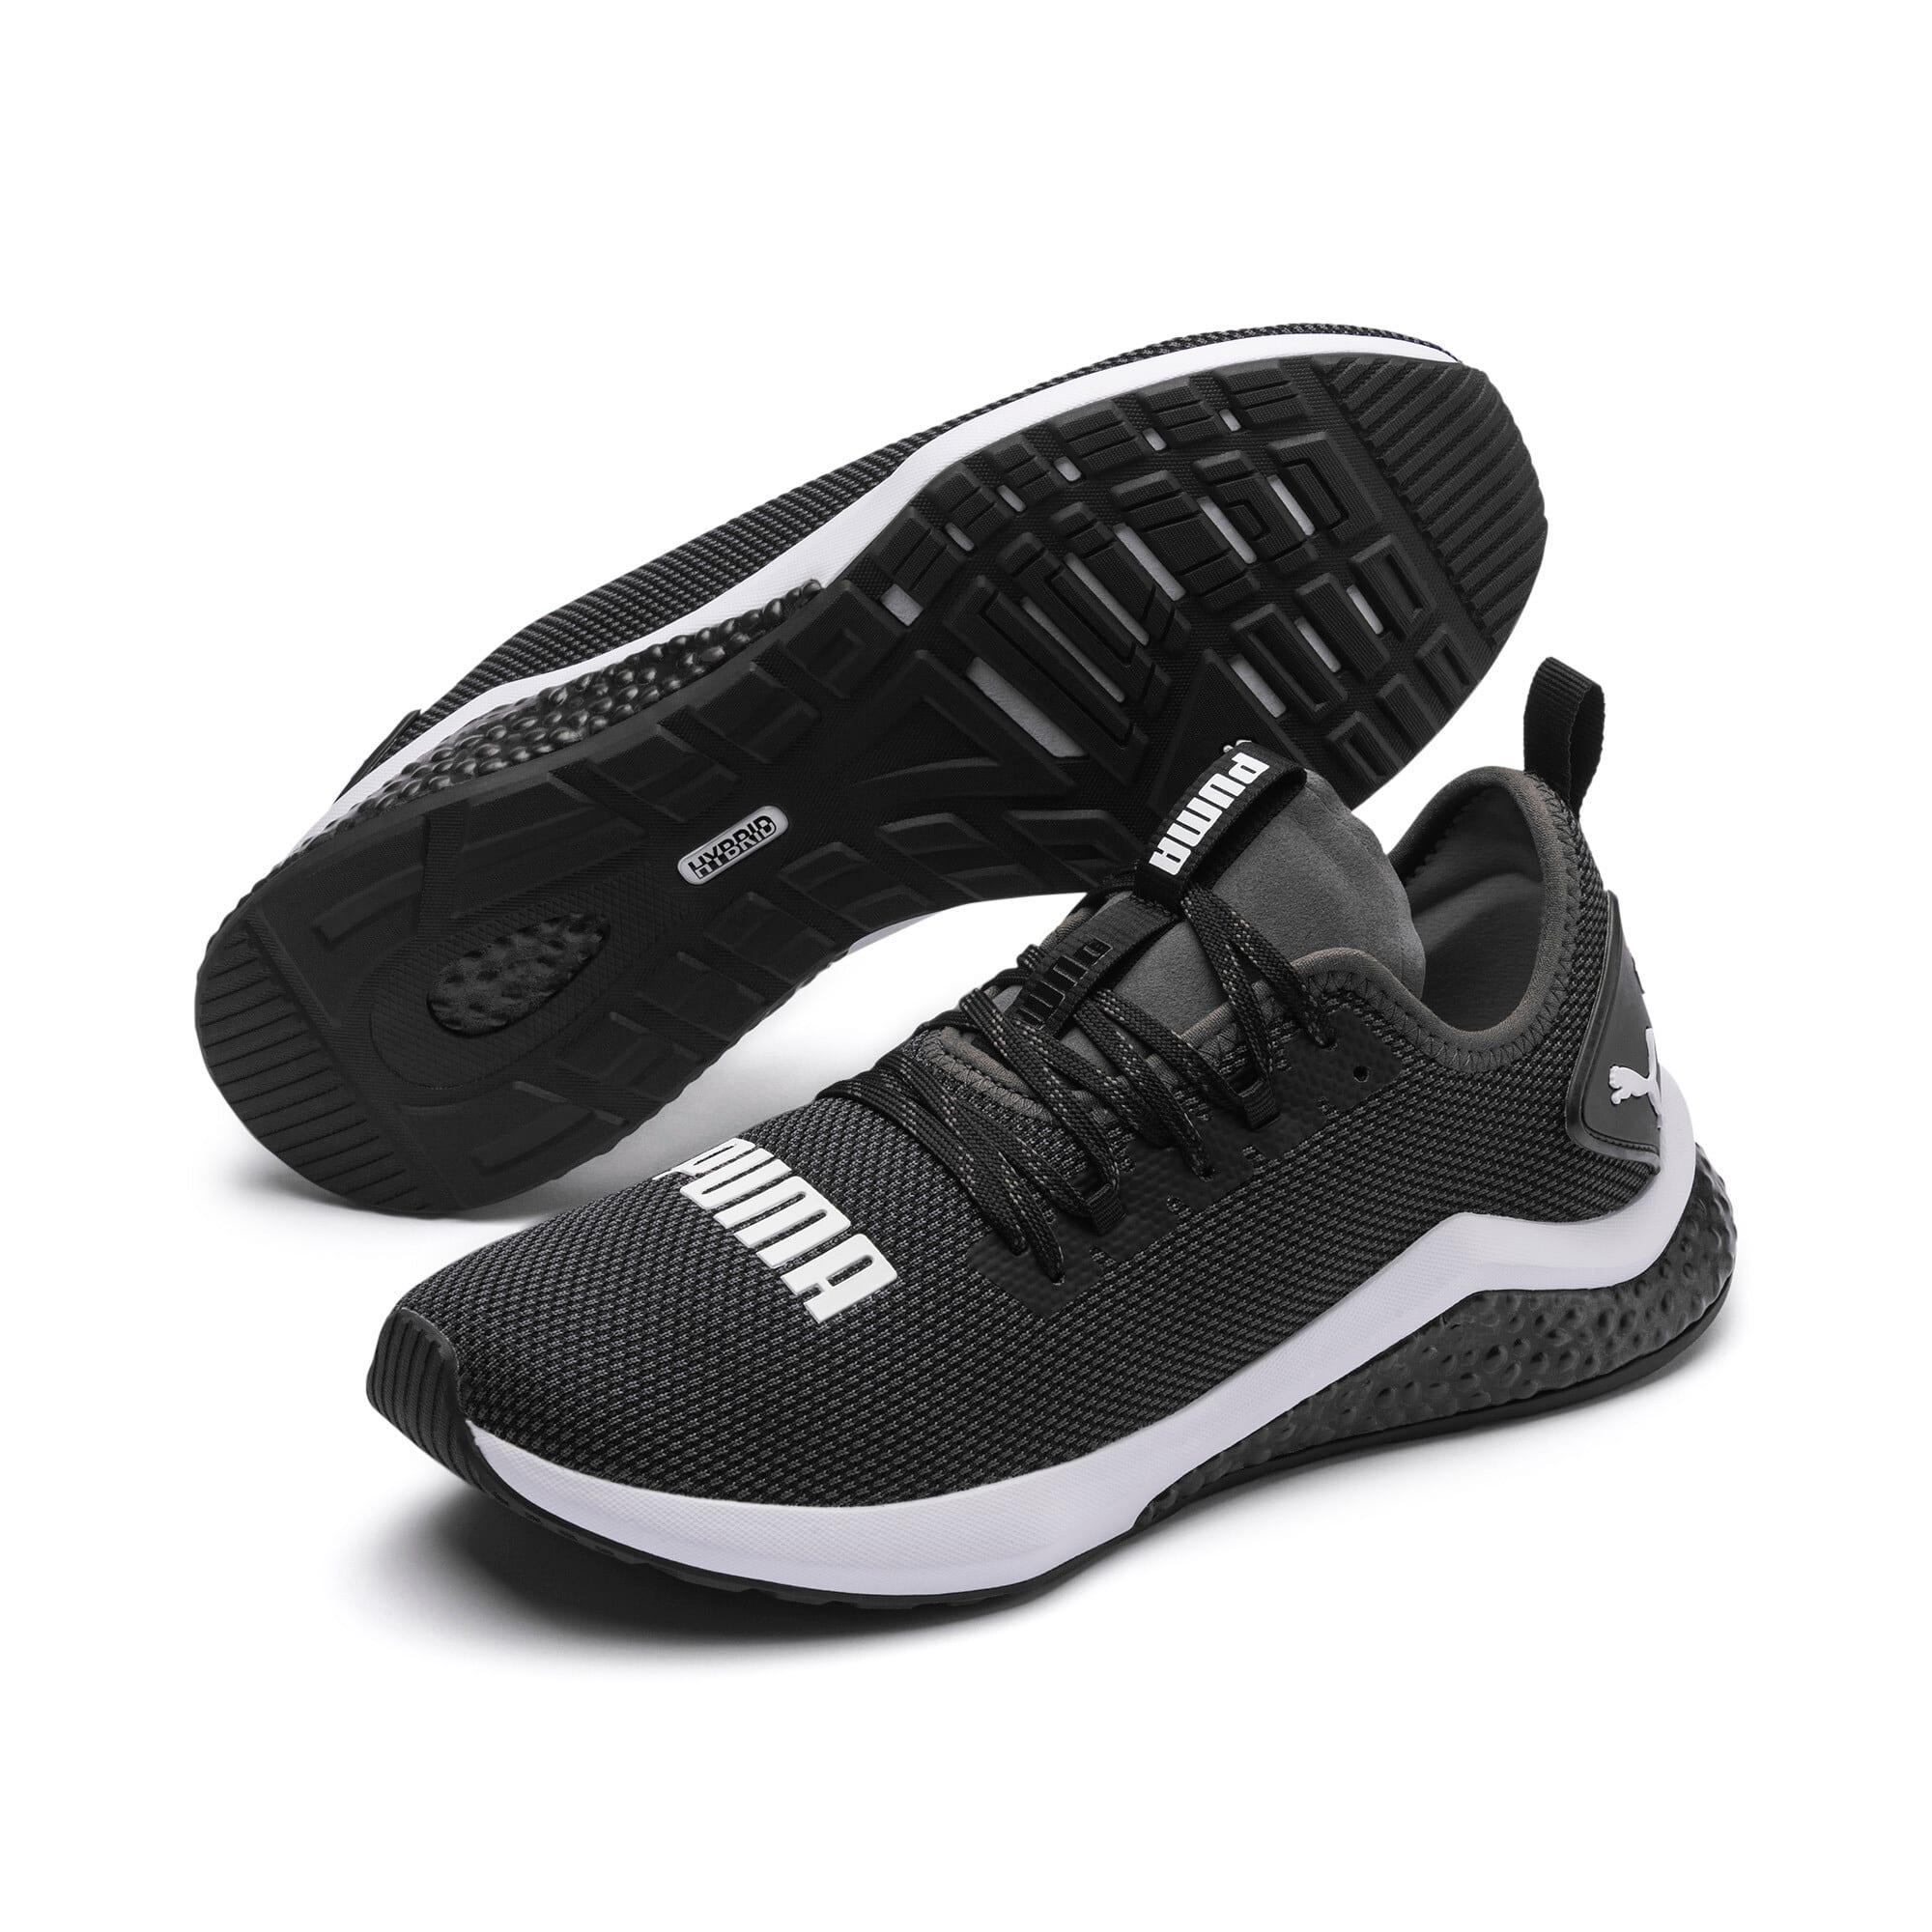 Thumbnail 3 of HYBRID NX Men's Running Shoes, Puma Black-Puma White, medium